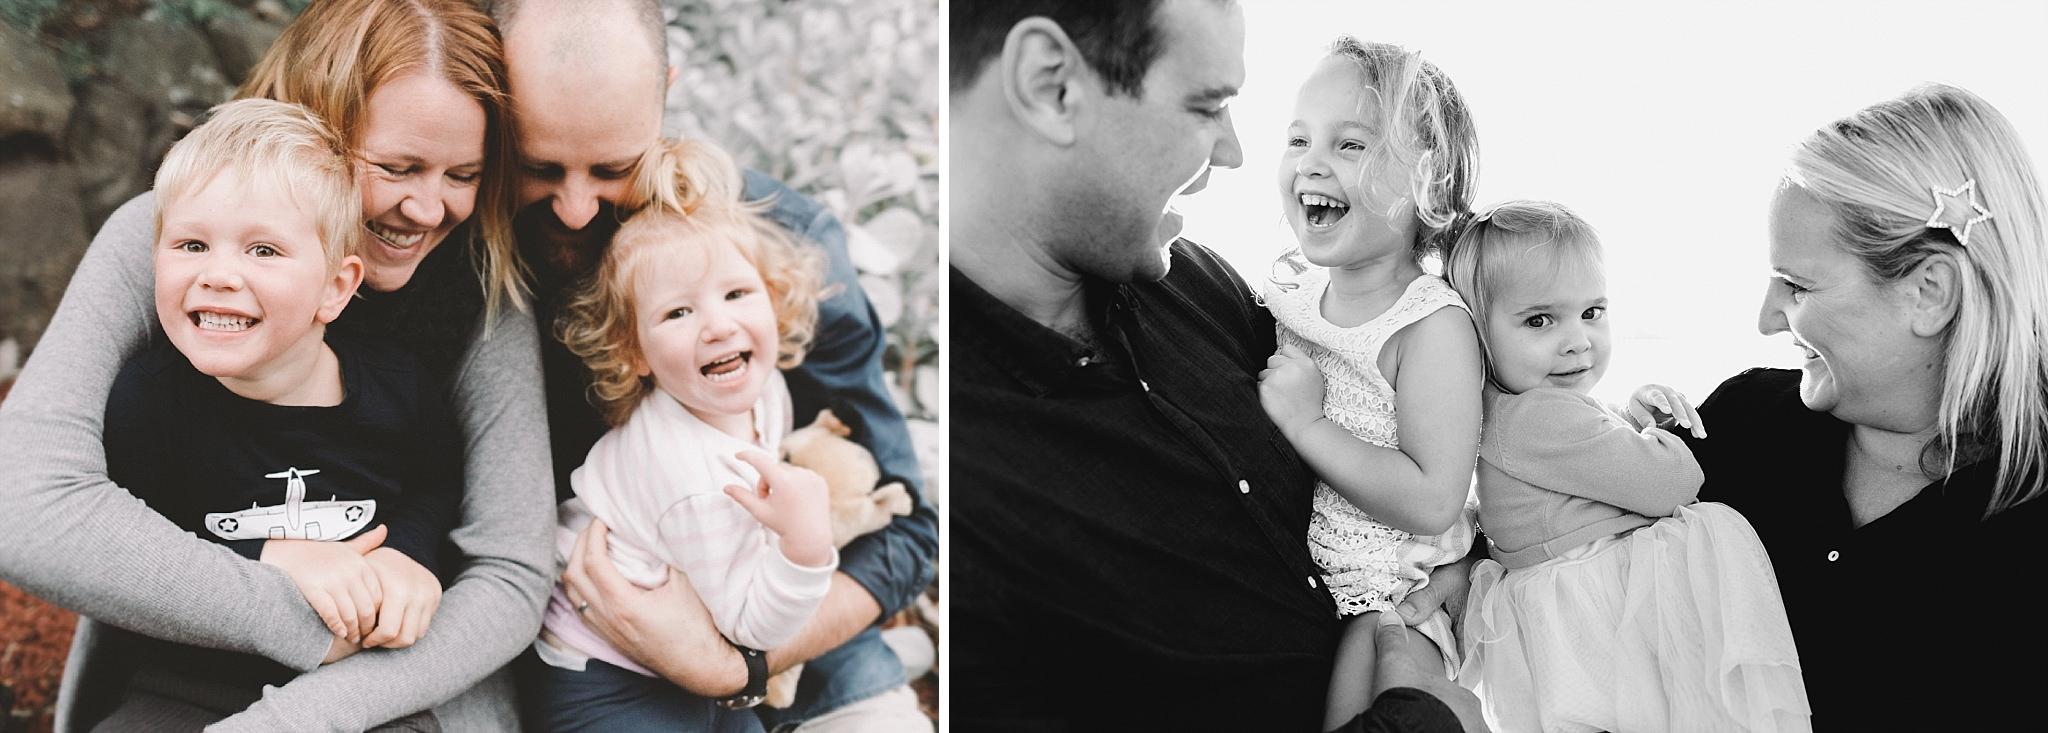 Lecinda Ward, Melbourne Family Newborn and Wedding Photographer_0023.jpg